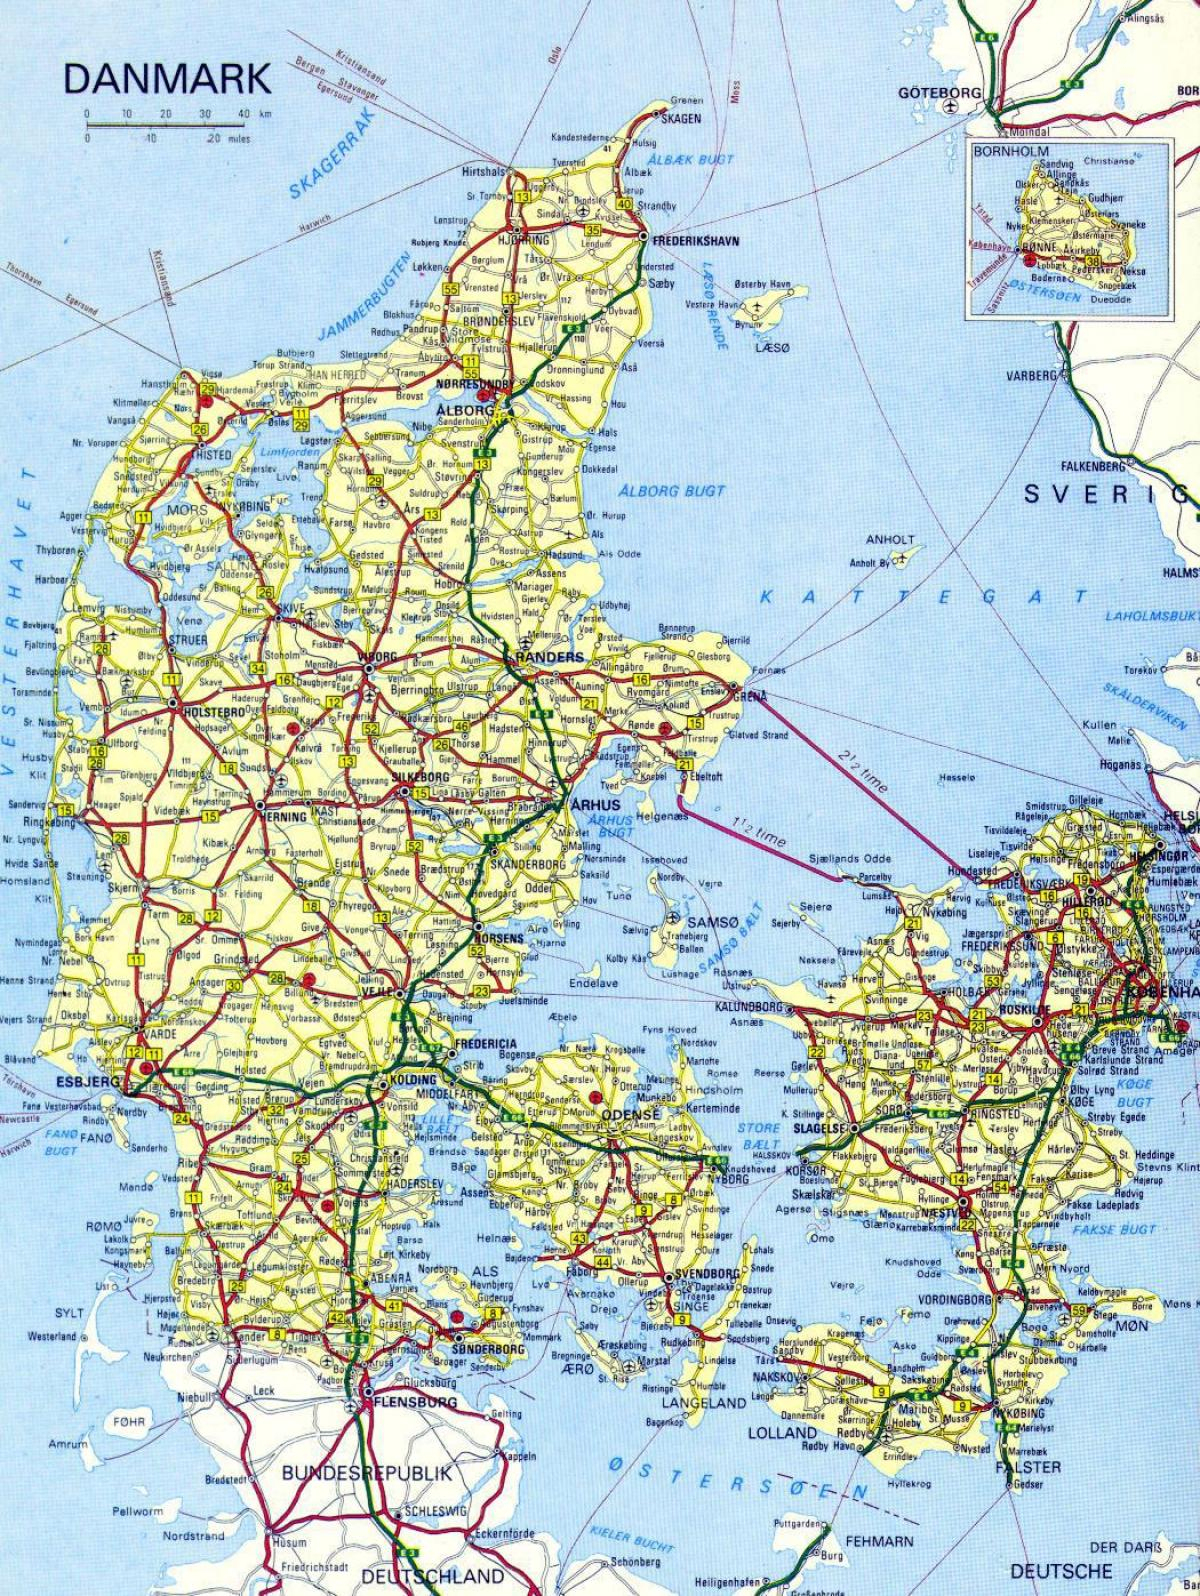 Carte Détaillée Du Danemark - Carte Détaillée De Danemark pour Carte De L Europe Détaillée